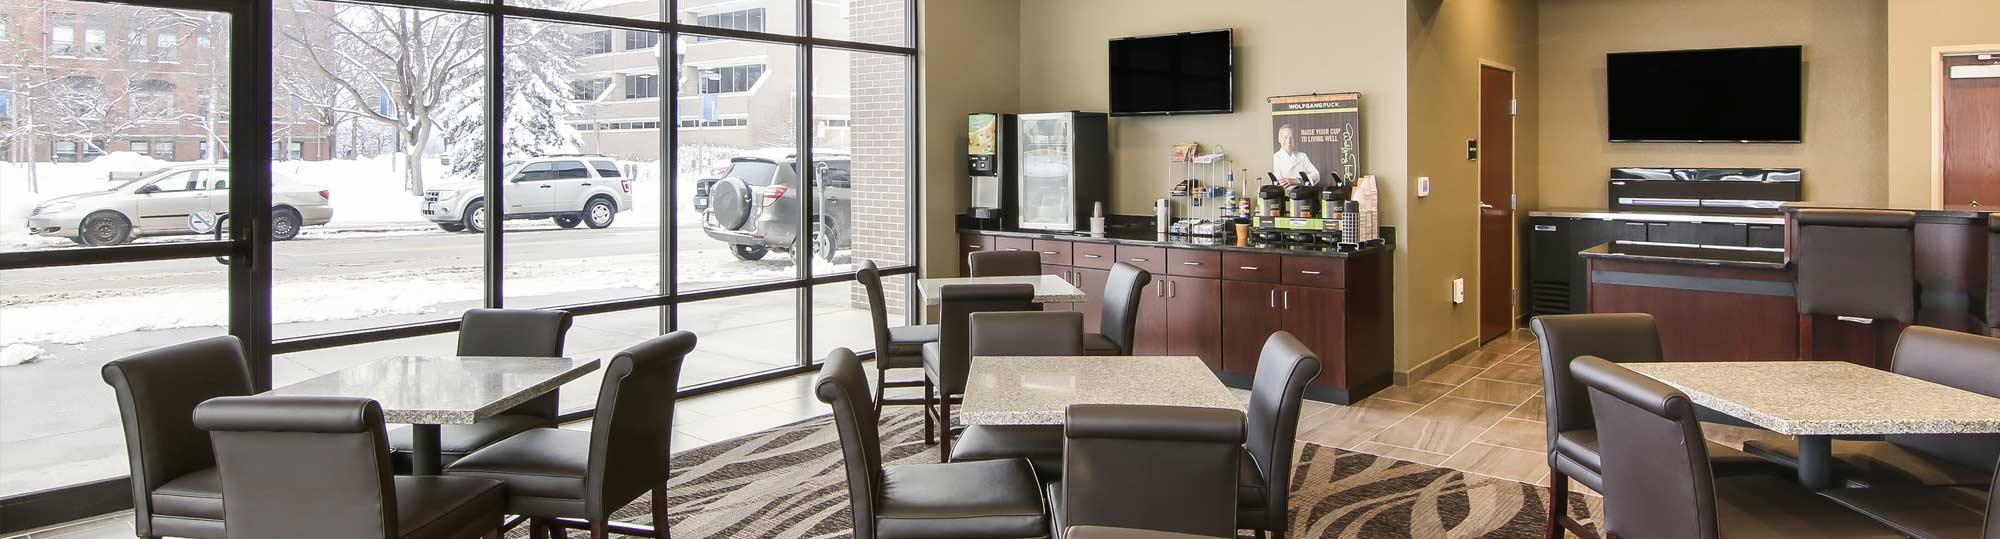 Cobblestone Inn & Suites Main Street Menomonie